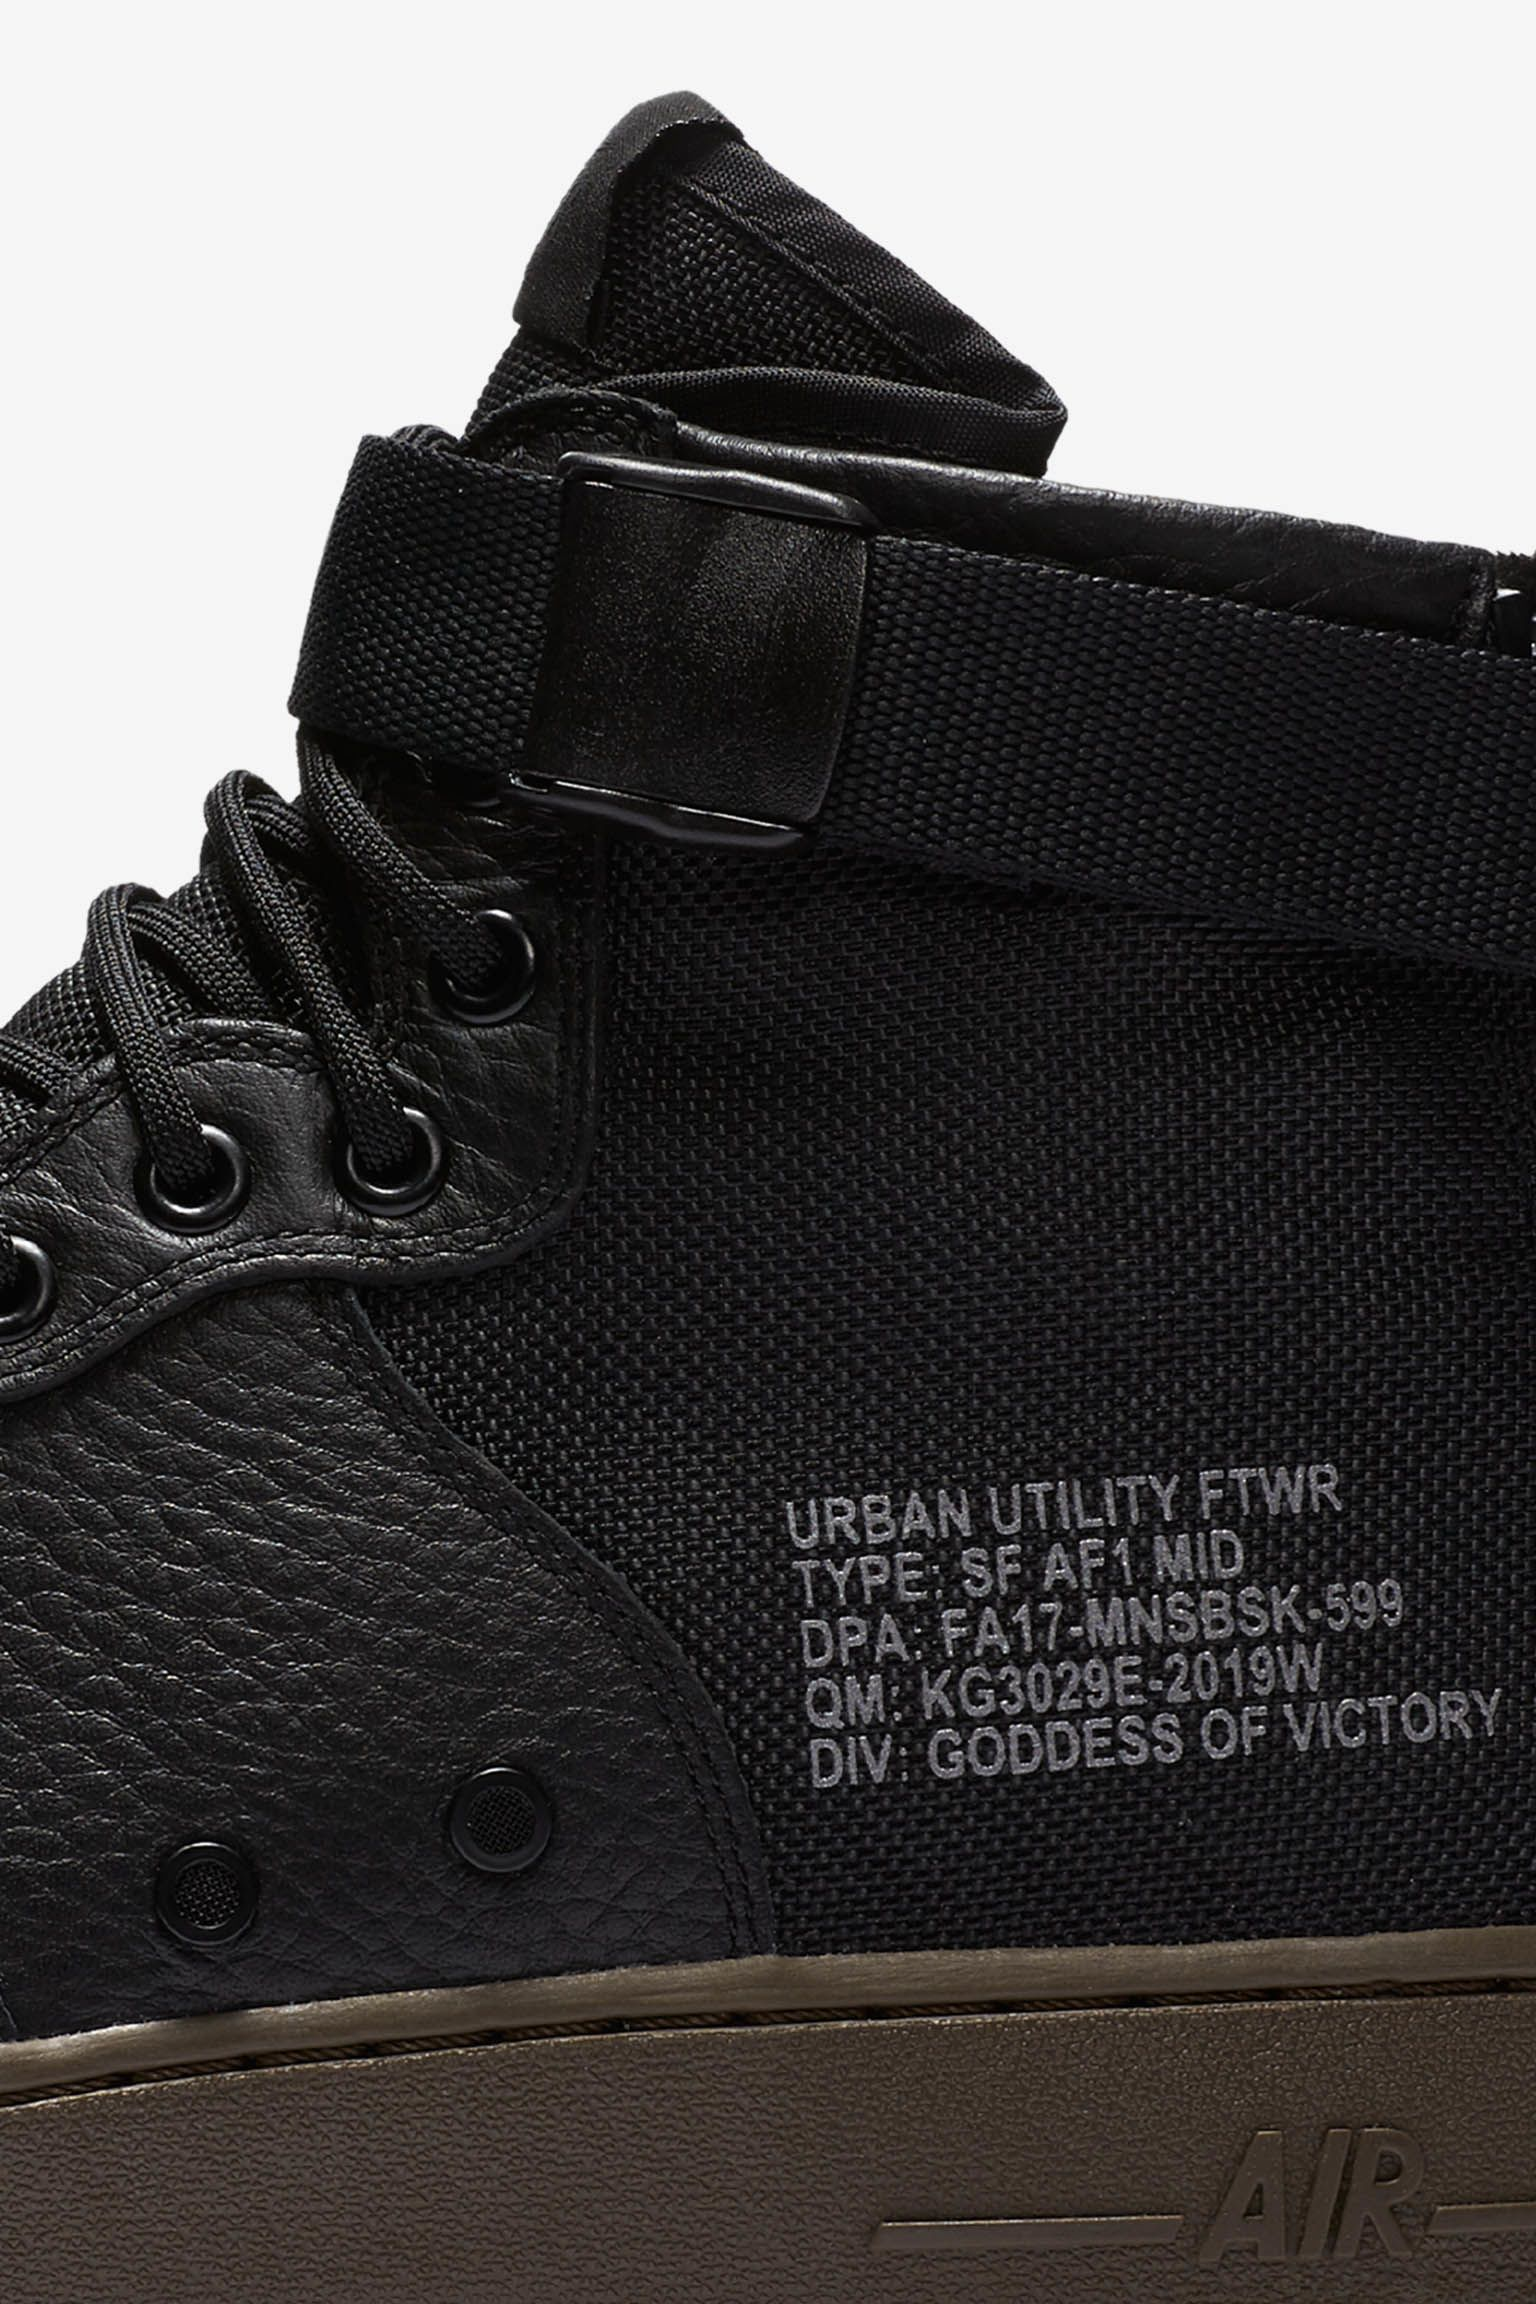 Nike SF AF-1 Mid 'Black & Dark Hazel'